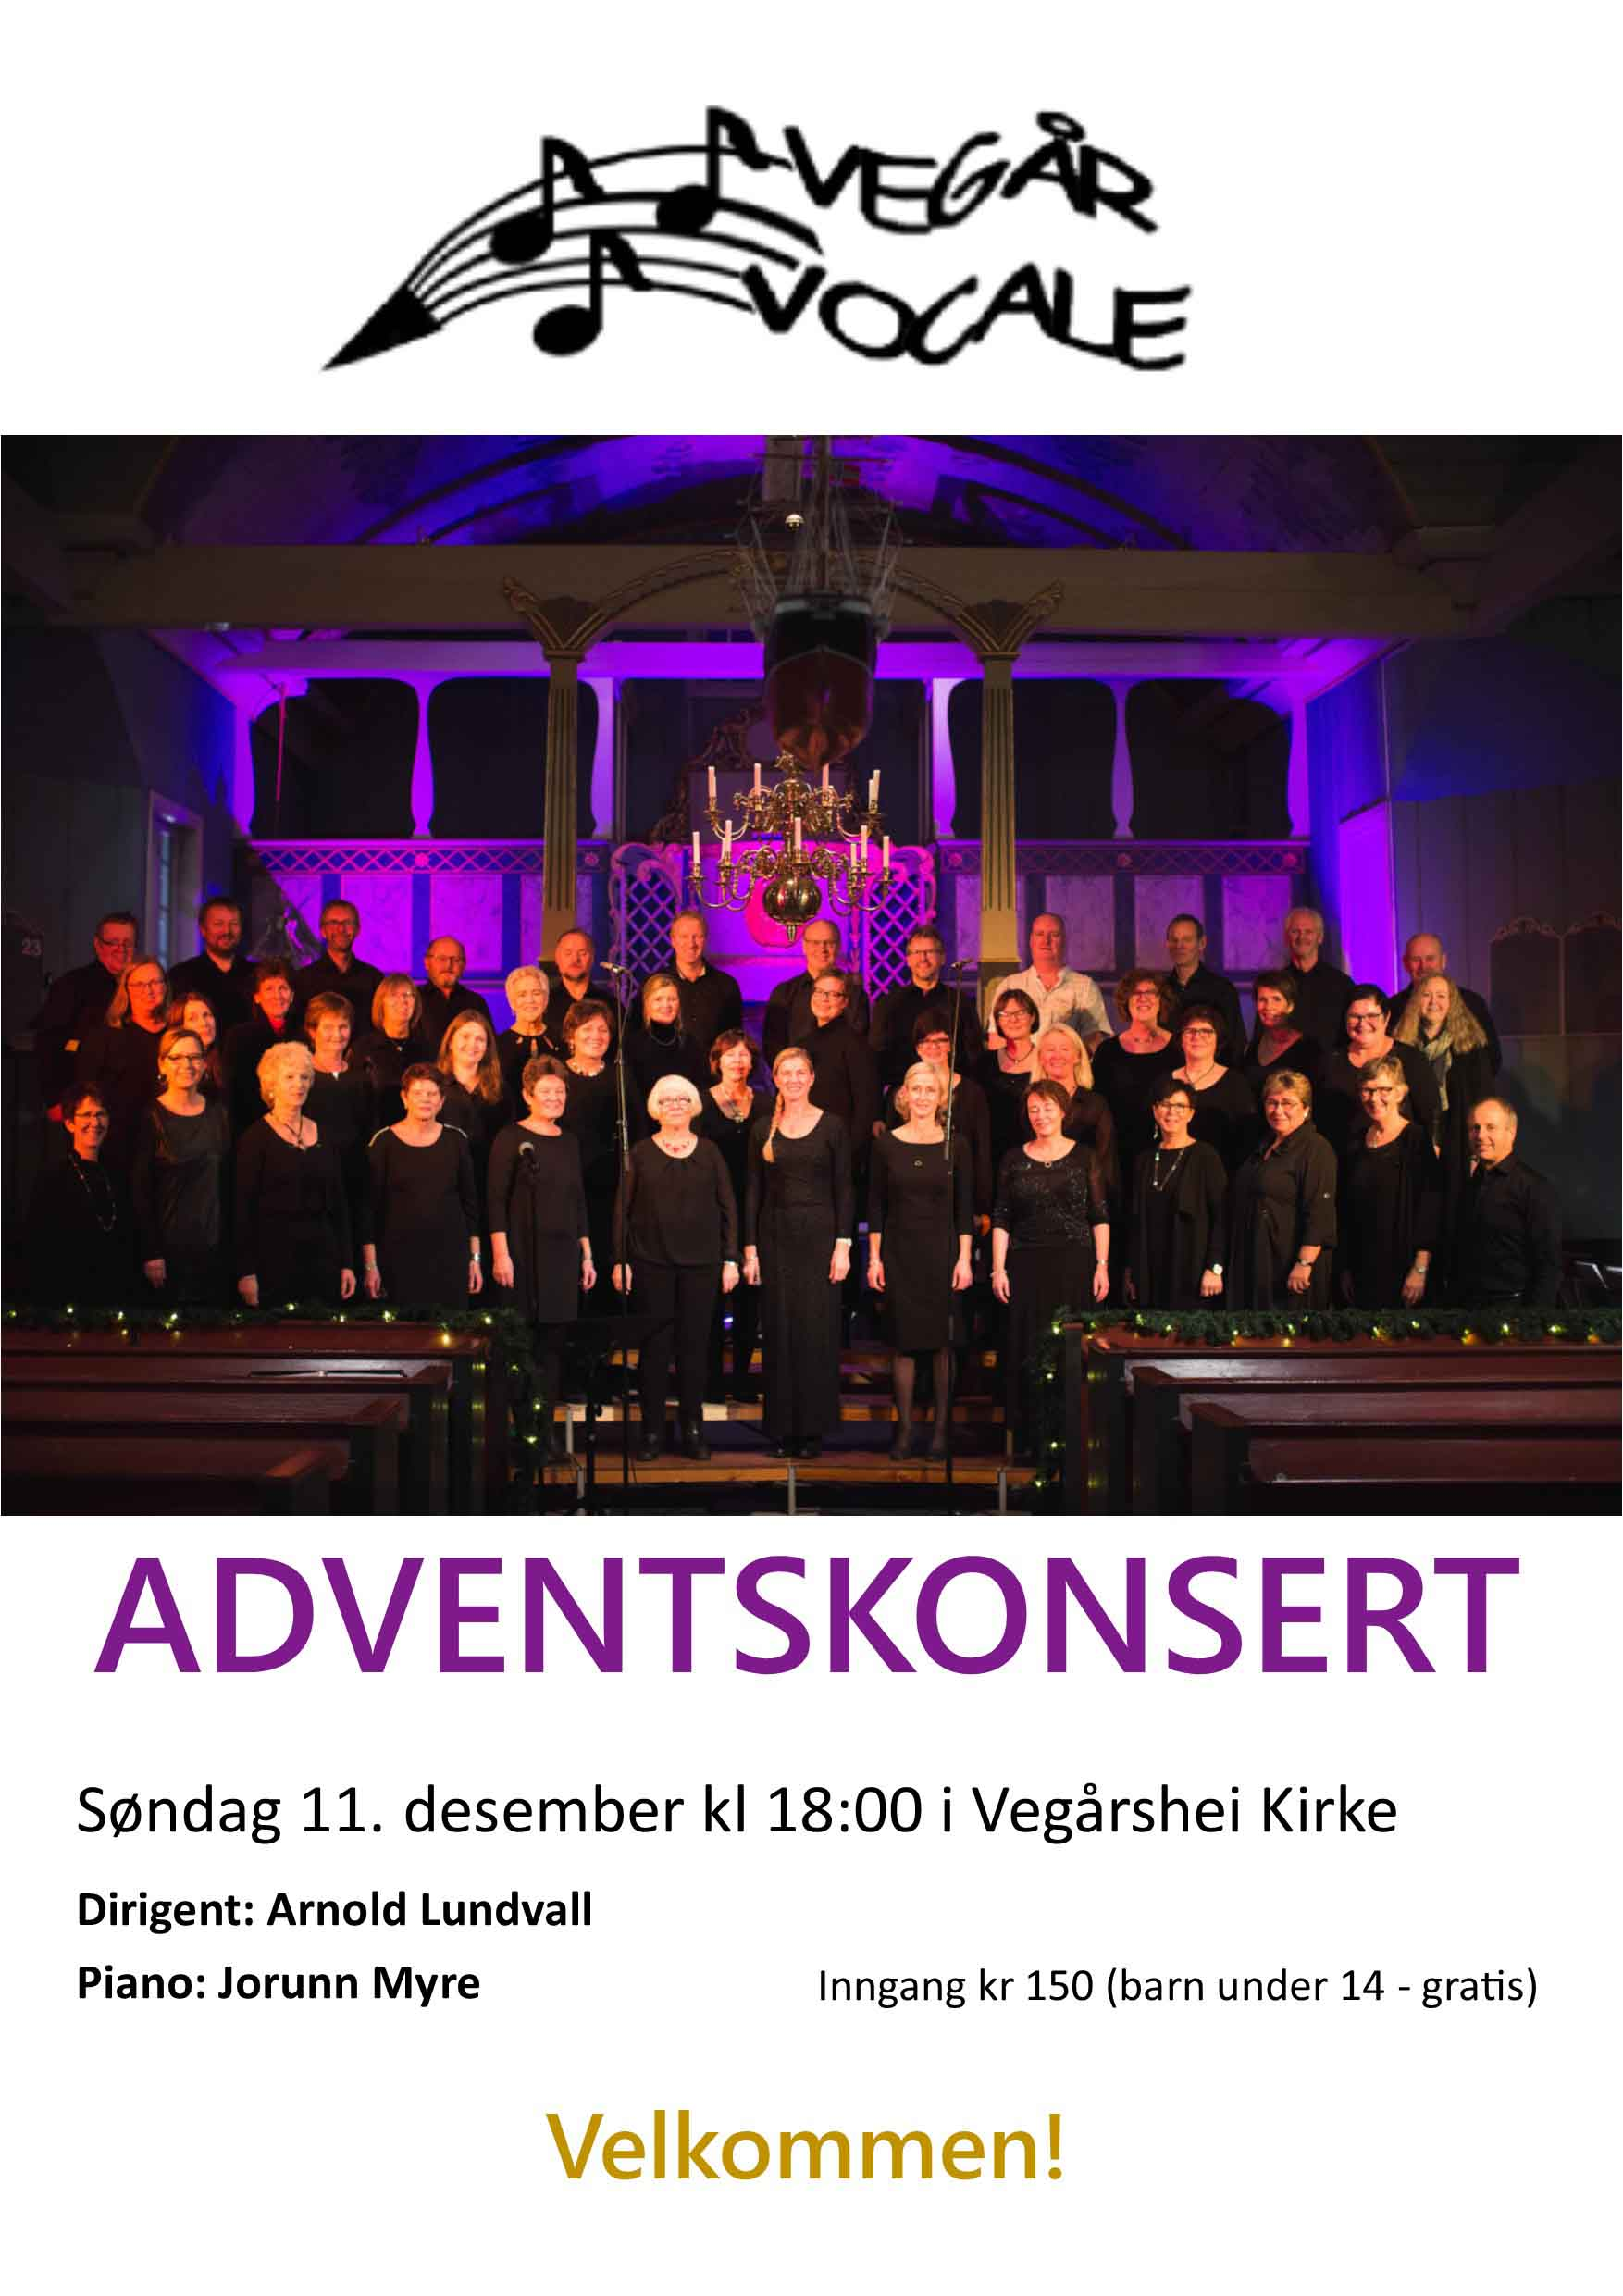 plakat-adventskonsert-2016-iten